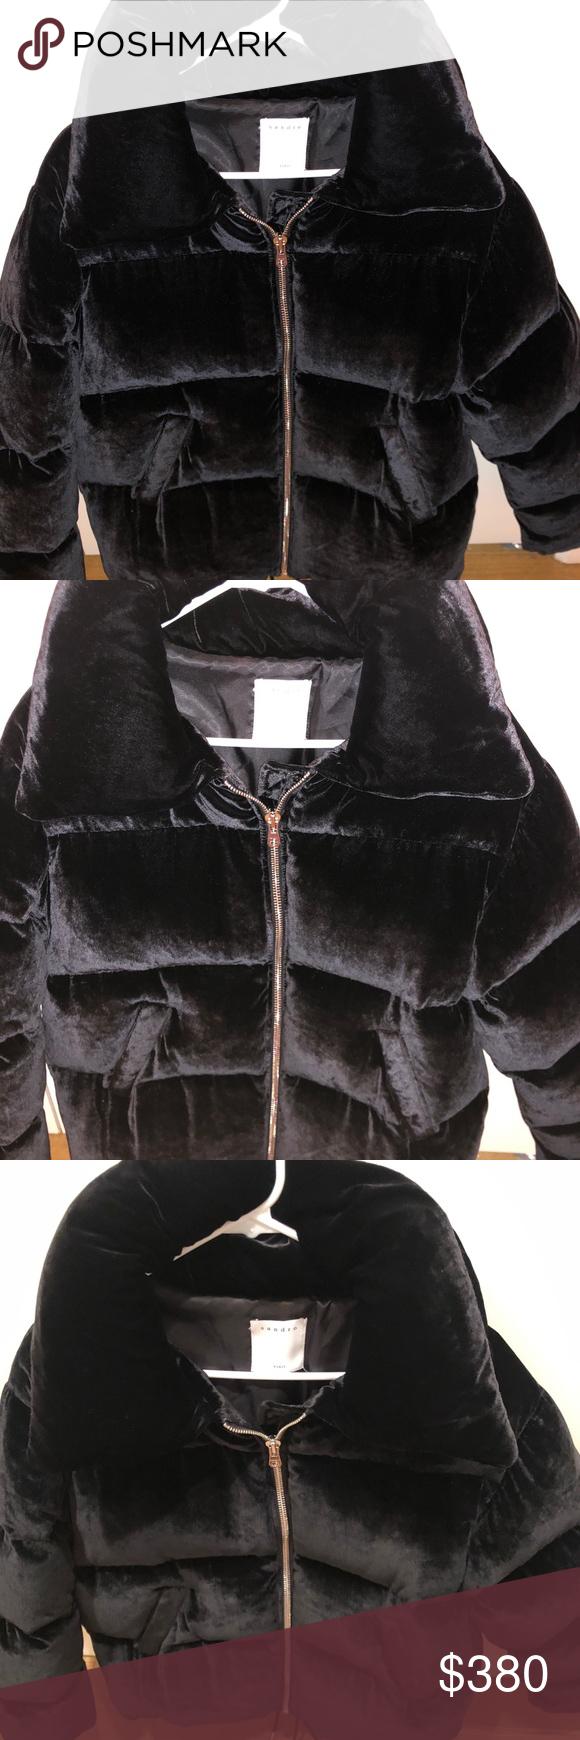 Sandro Velvet Puffer Coat Never Worn Sandro Atenea Velvet Puffer Coat Size 40 Large Supposed To Fit Oversized Very Warm Fashion Clothes Design Puffer Coat [ 1740 x 580 Pixel ]